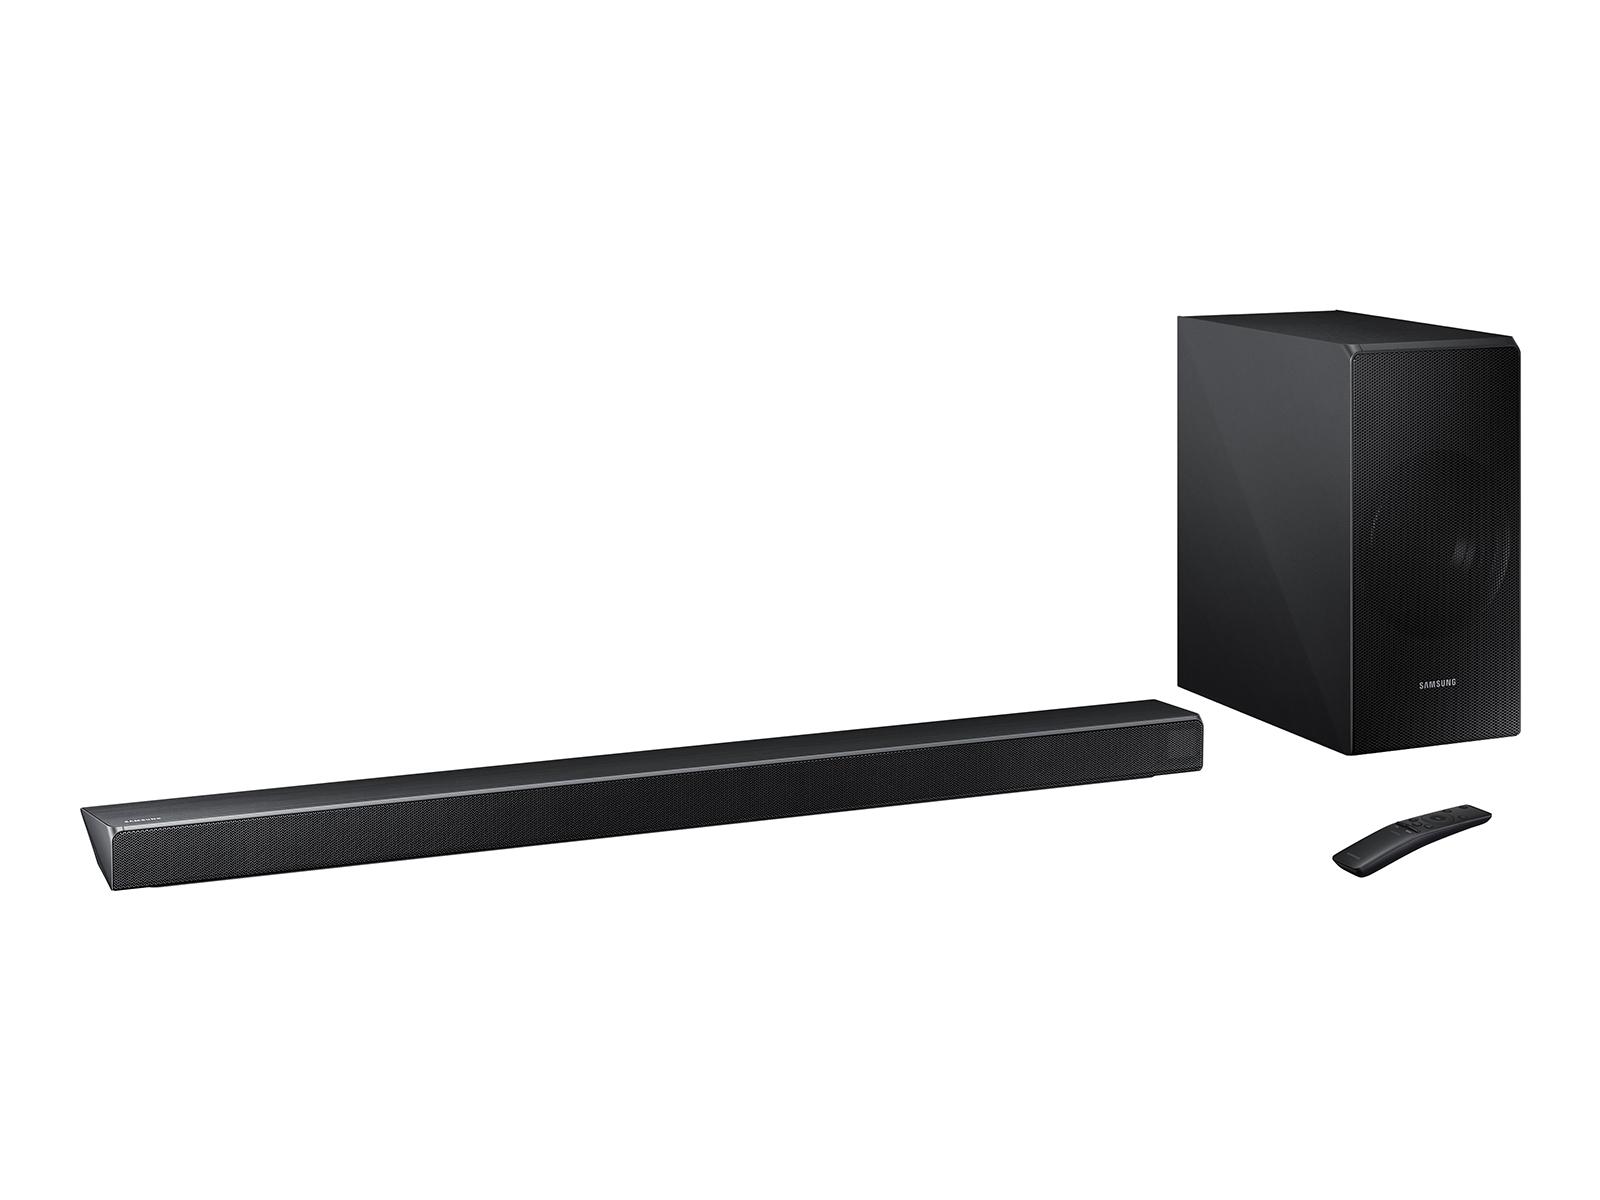 Hw N550 Soundbar Home Theater Za Samsung Us Wiring Guide For 7 2